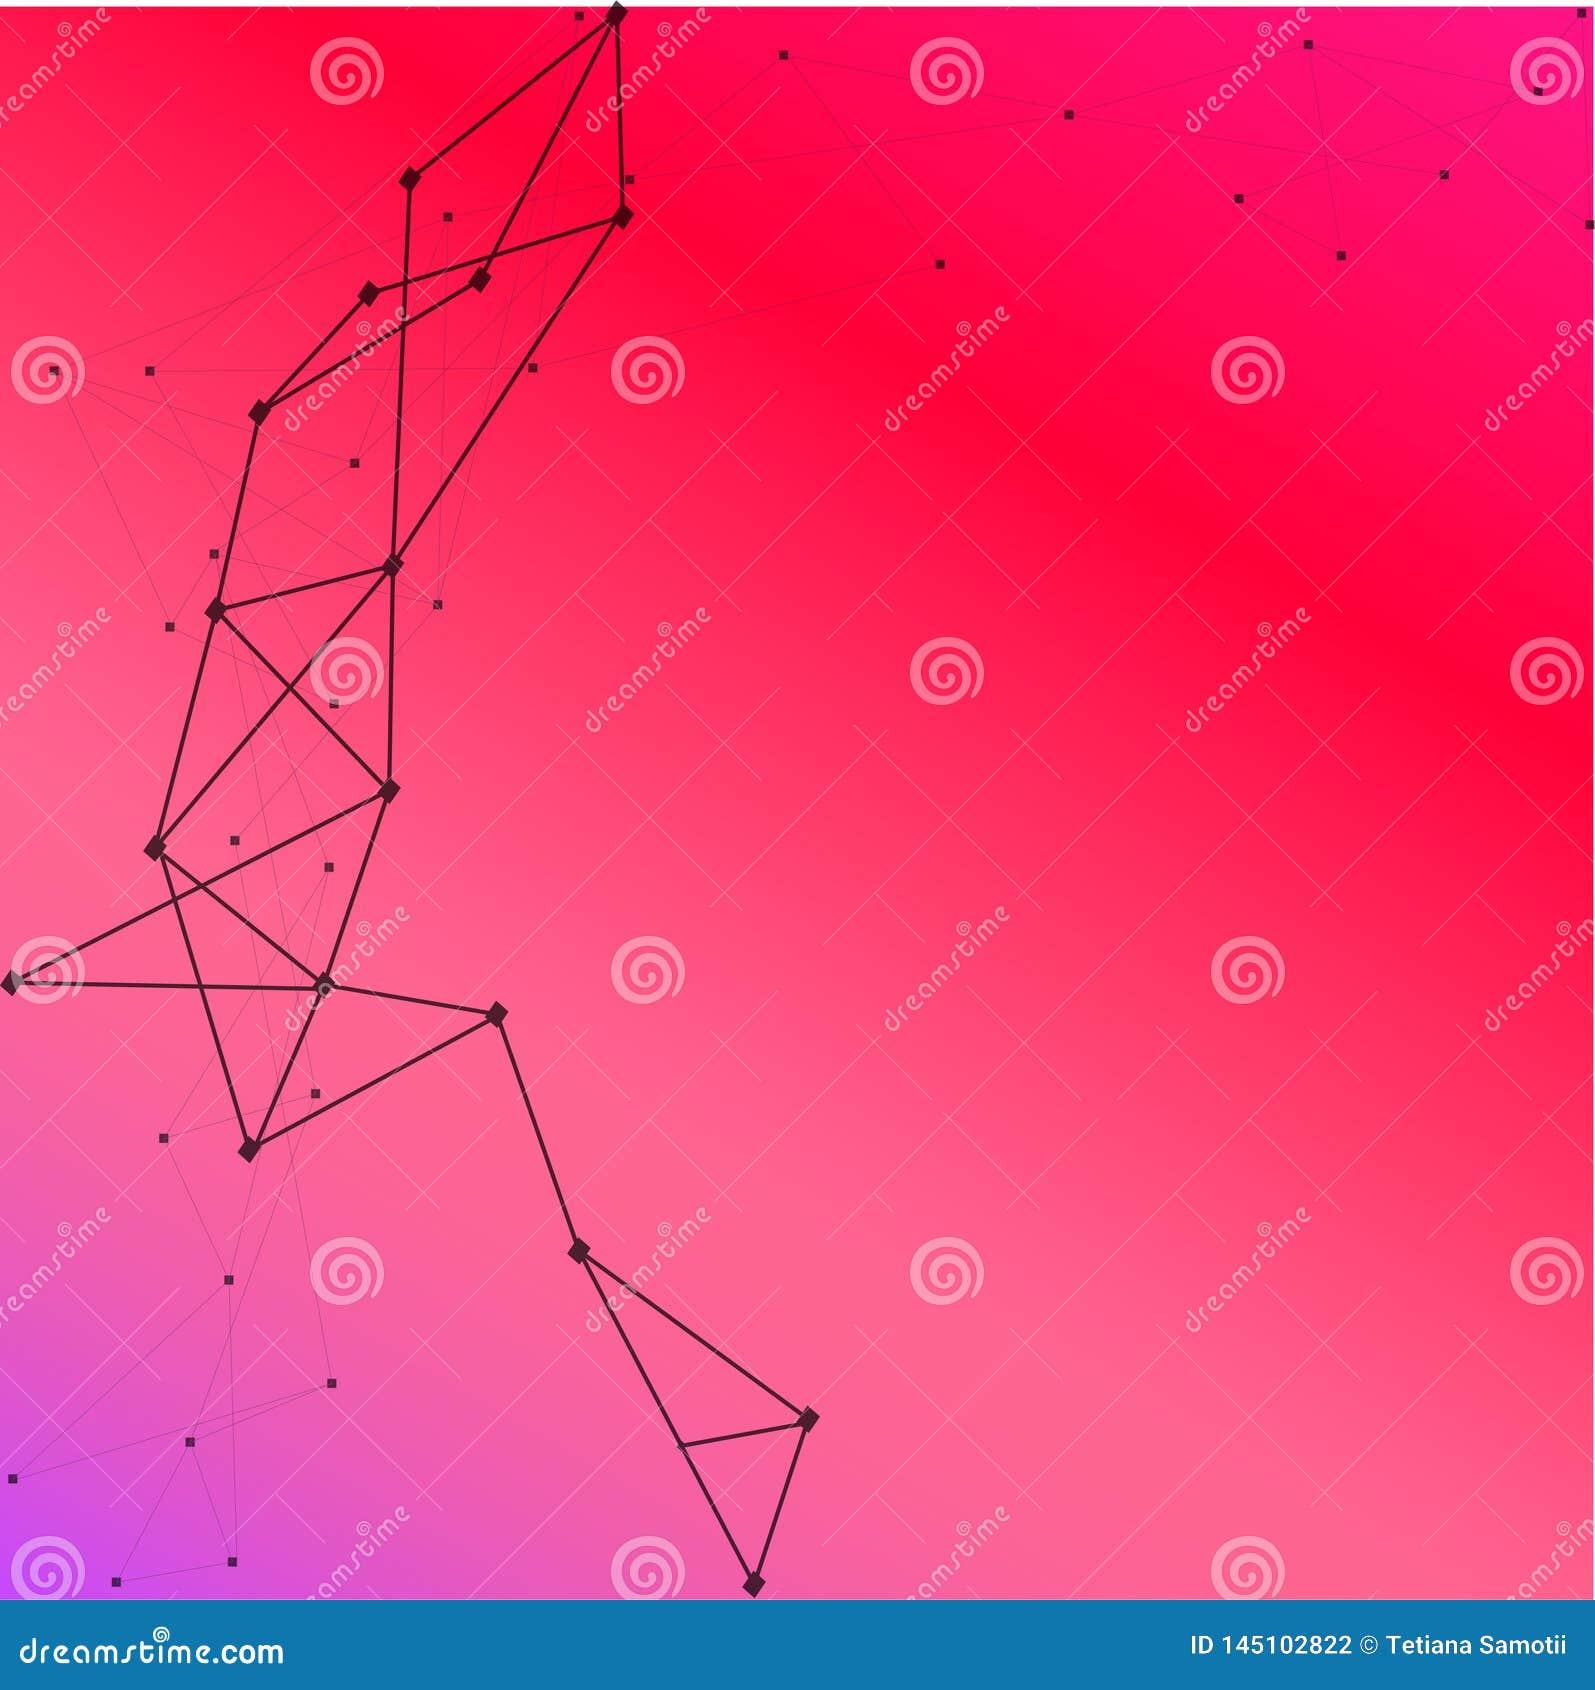 O Διανυσματικό αφηρημένο υπόβαθρο κιβωτίων Σύγχρονη απεικόνιση τεχνολογίας με το τετραγωνικό πλέγμα Ψηφιακή γεωμετρική αφαίρεση μ